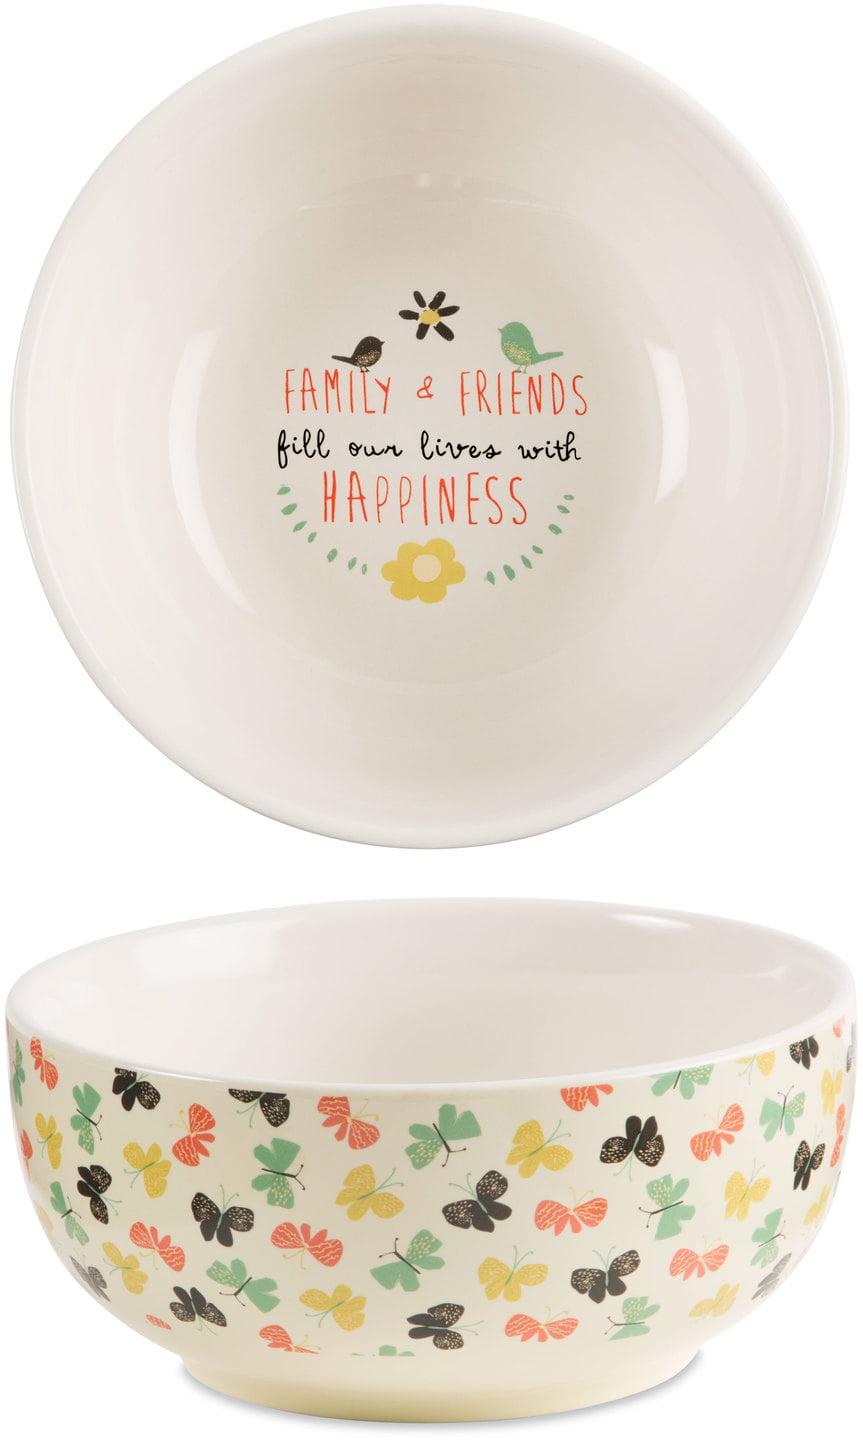 Pavilion Family Friends Fill Our Lives With Happiness Decorative Ceramic Bowl Walmart Com Walmart Com